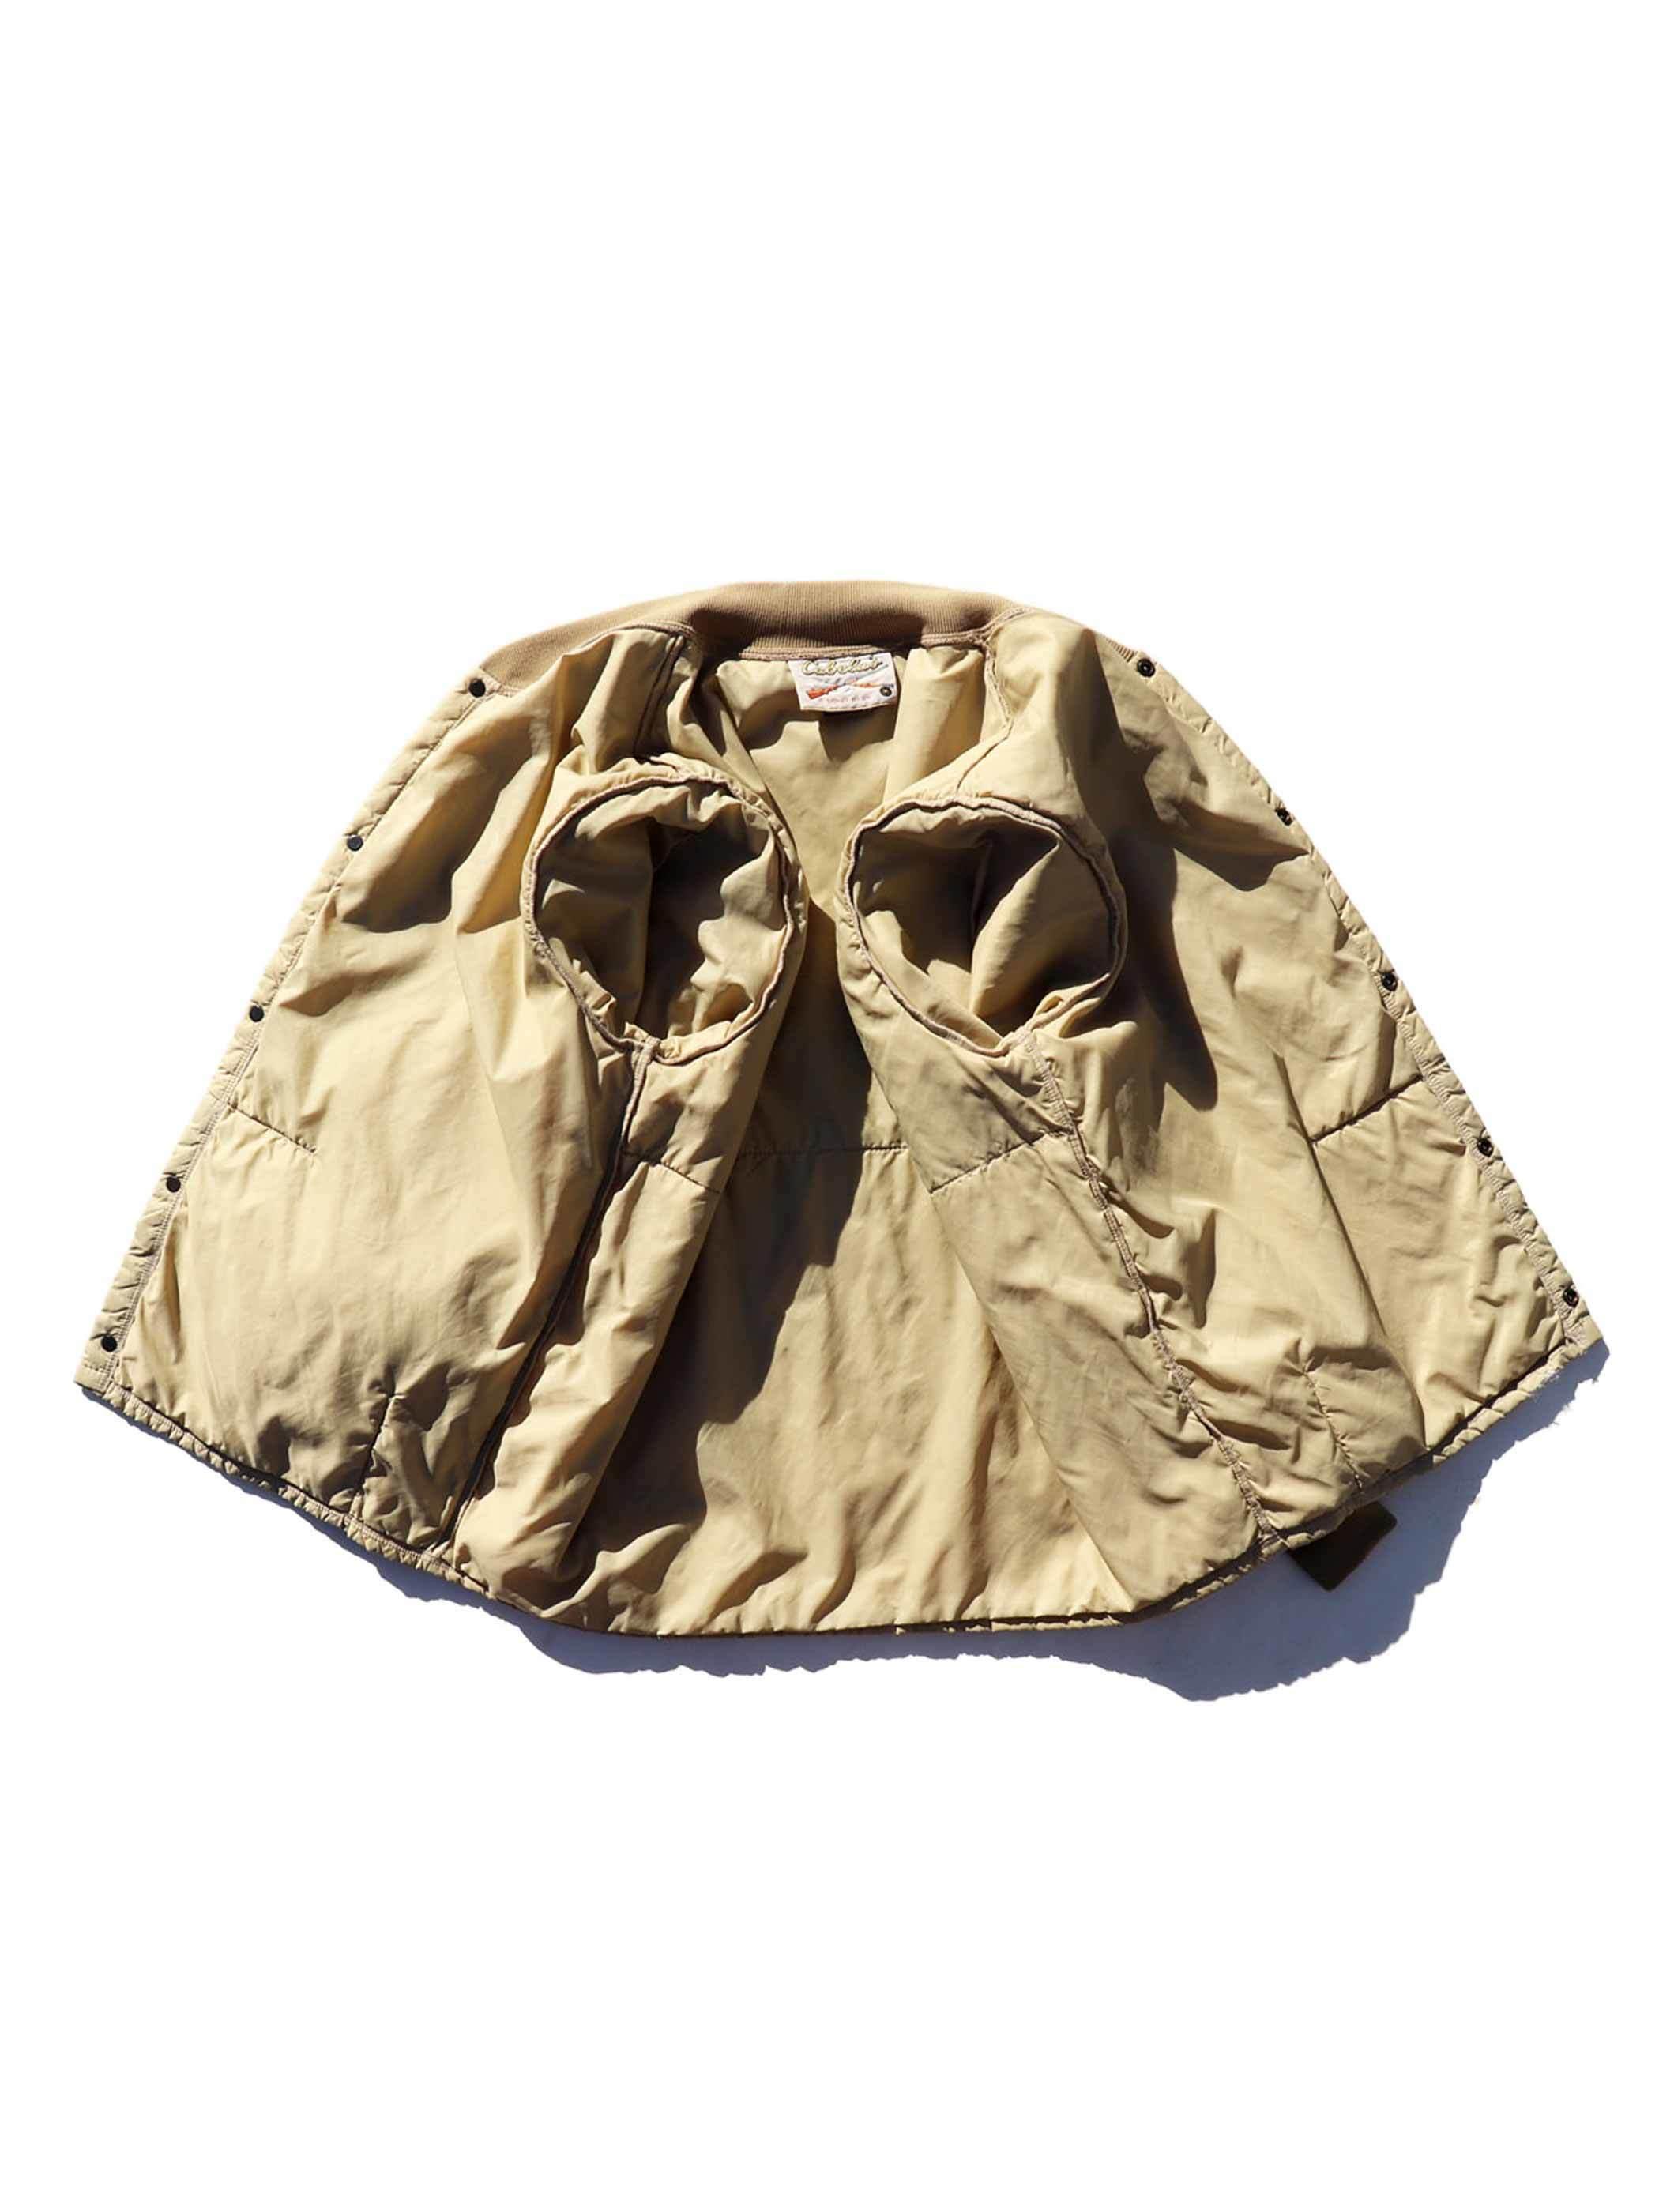 80's CABELA'S シンサレート パディングジャケット [XL]